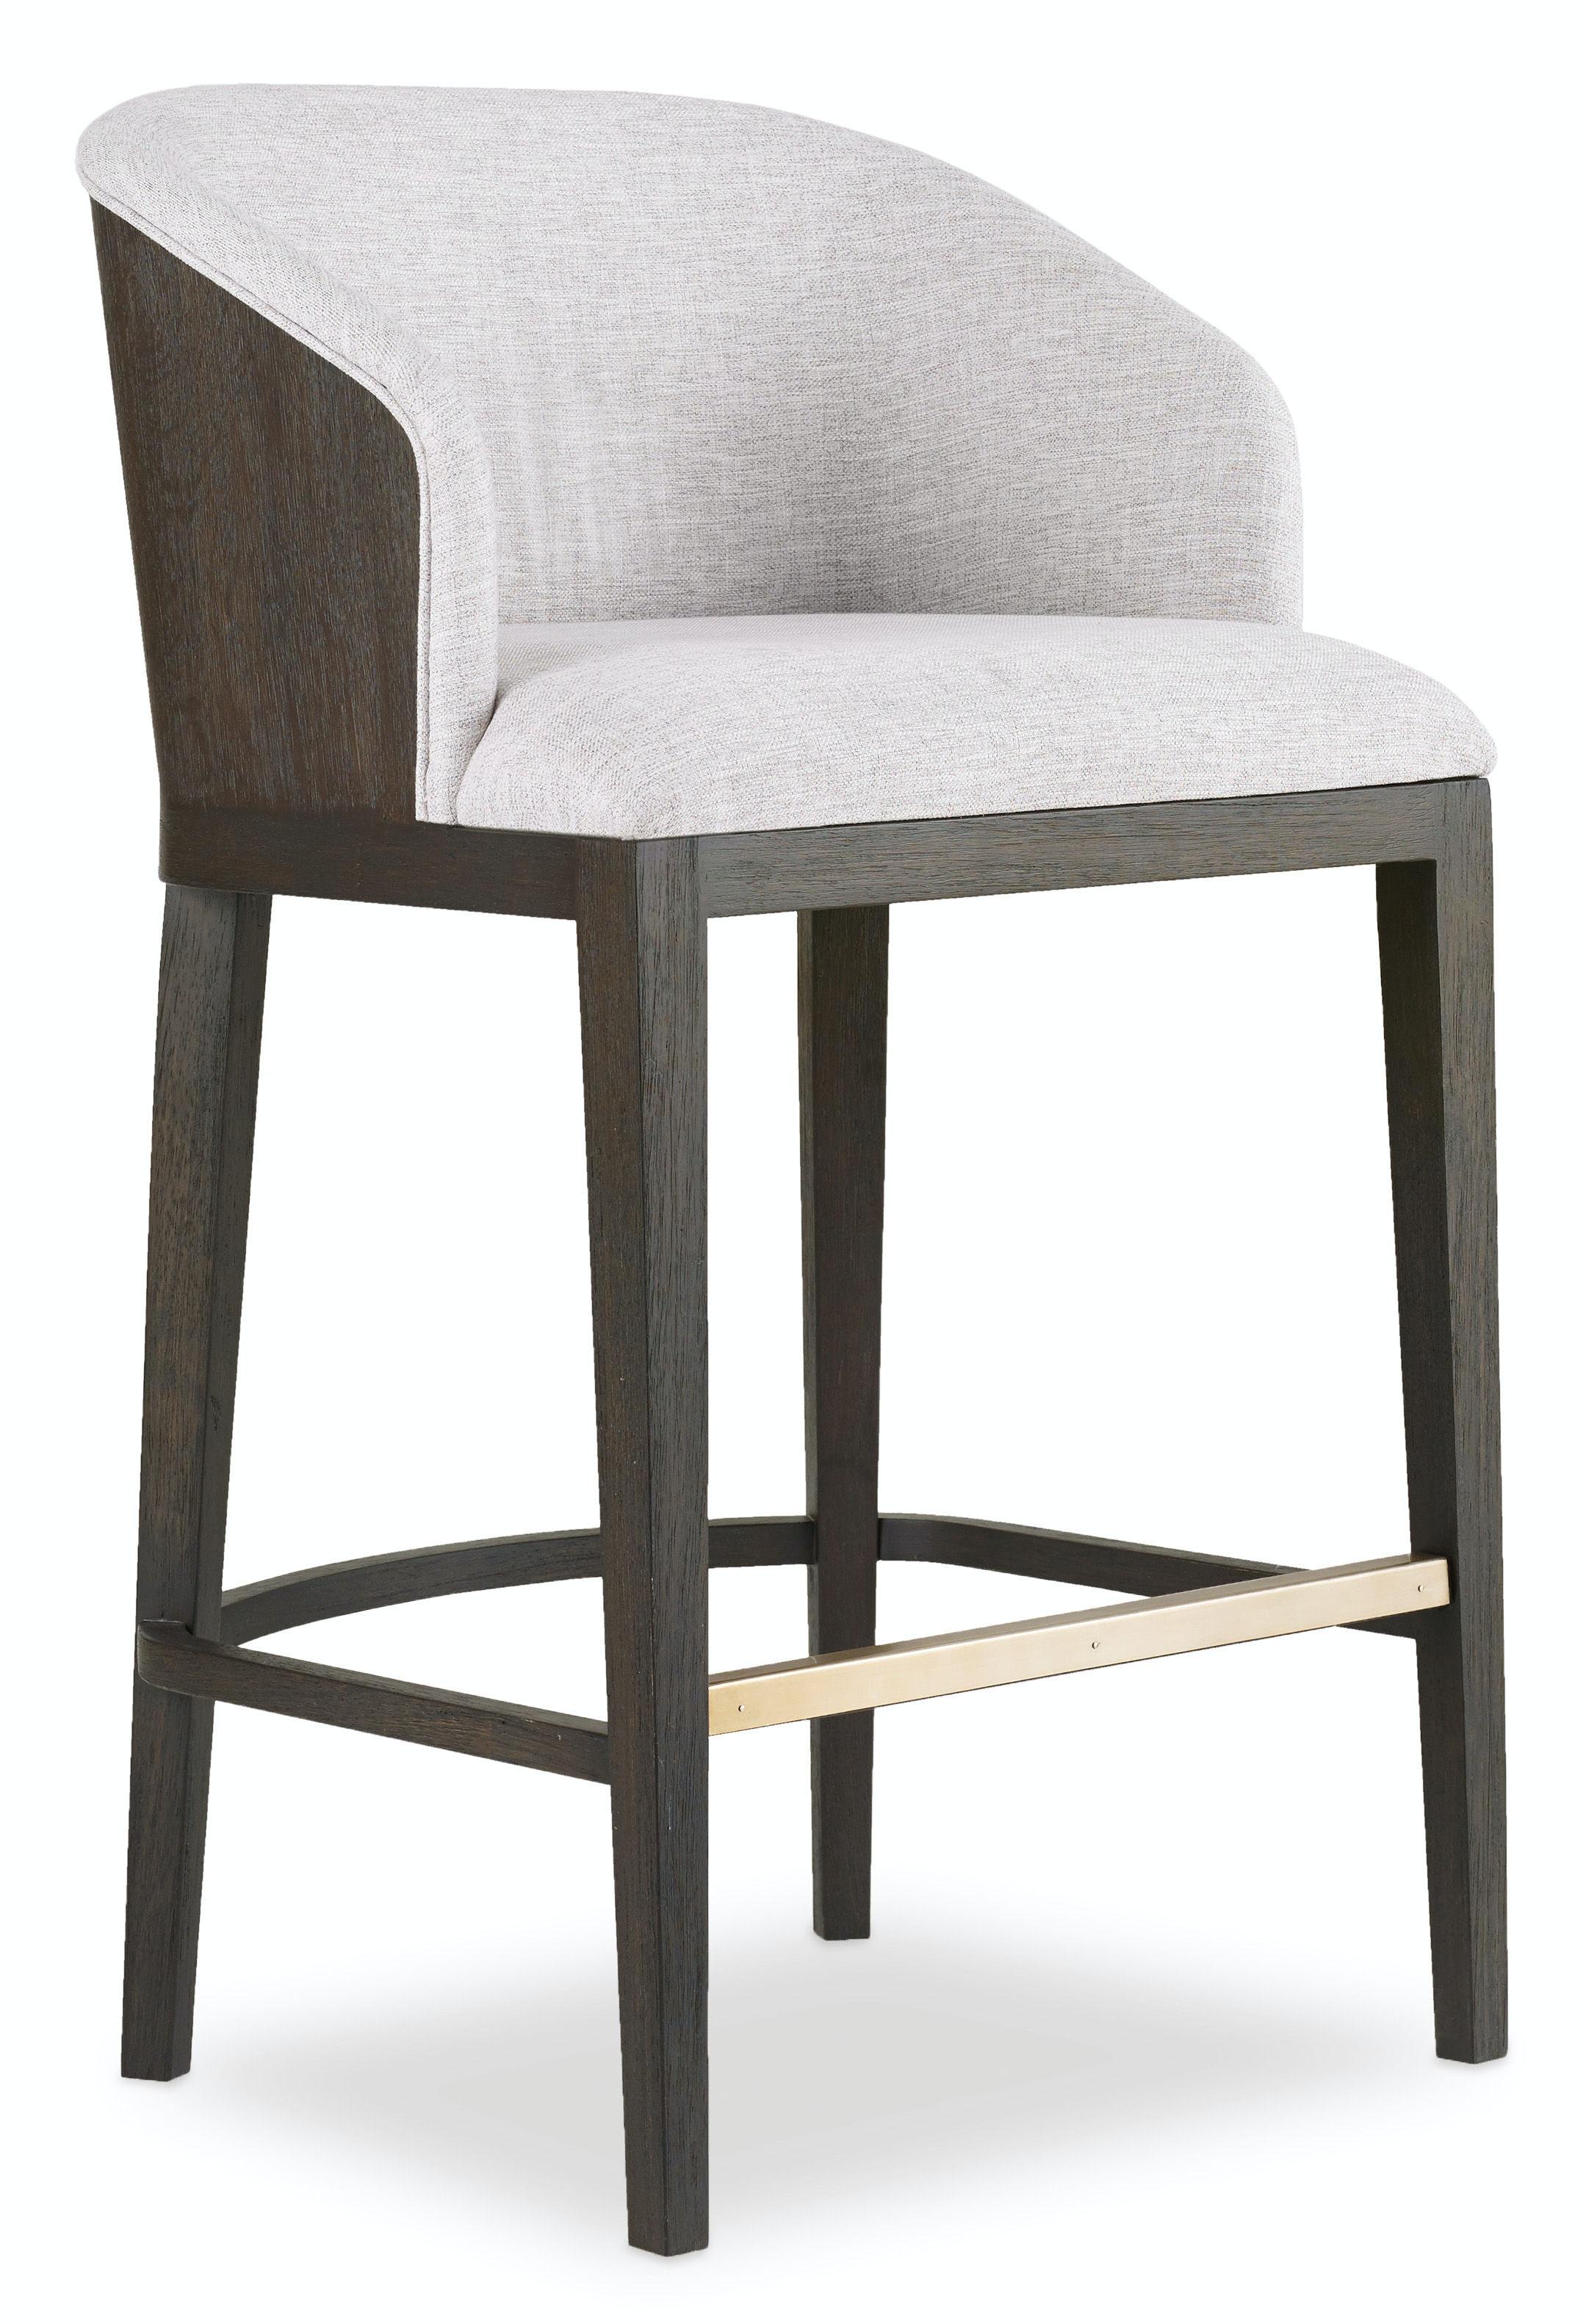 Hooker Furniture Dining Room Curata Upholstered Bar Stool